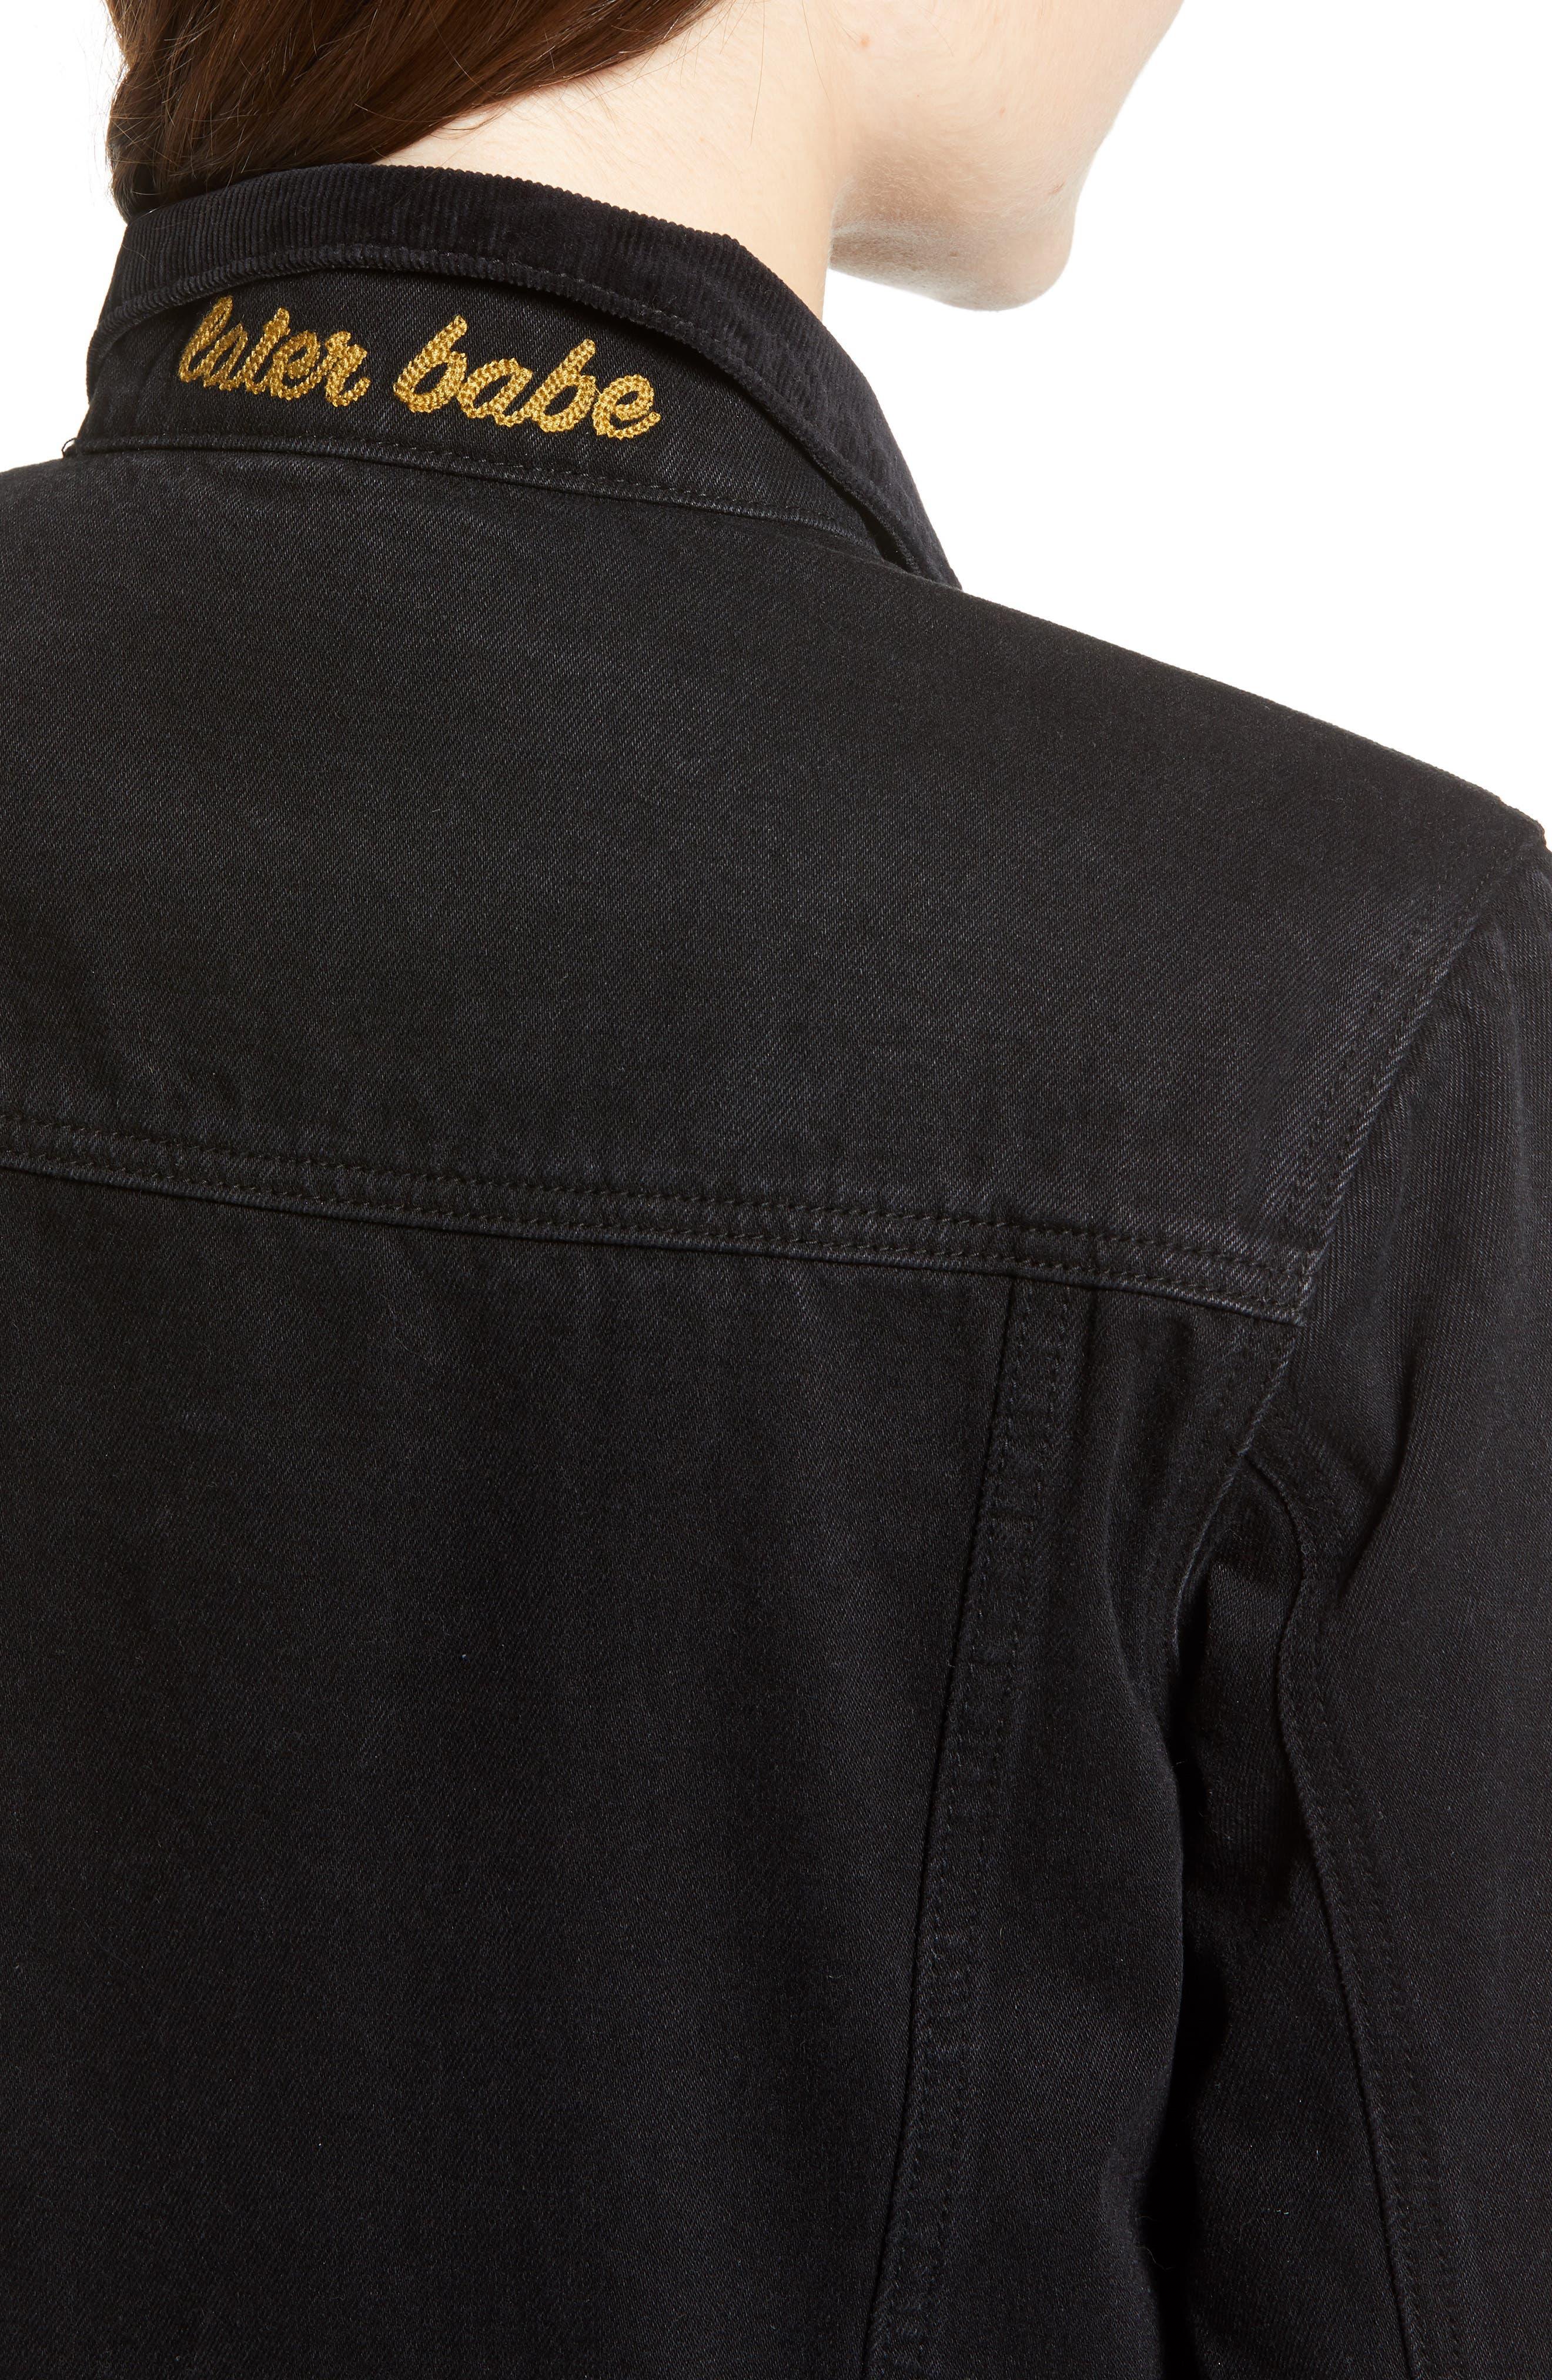 Polara Denim Jacket,                             Alternate thumbnail 4, color,                             WASHED BLACK